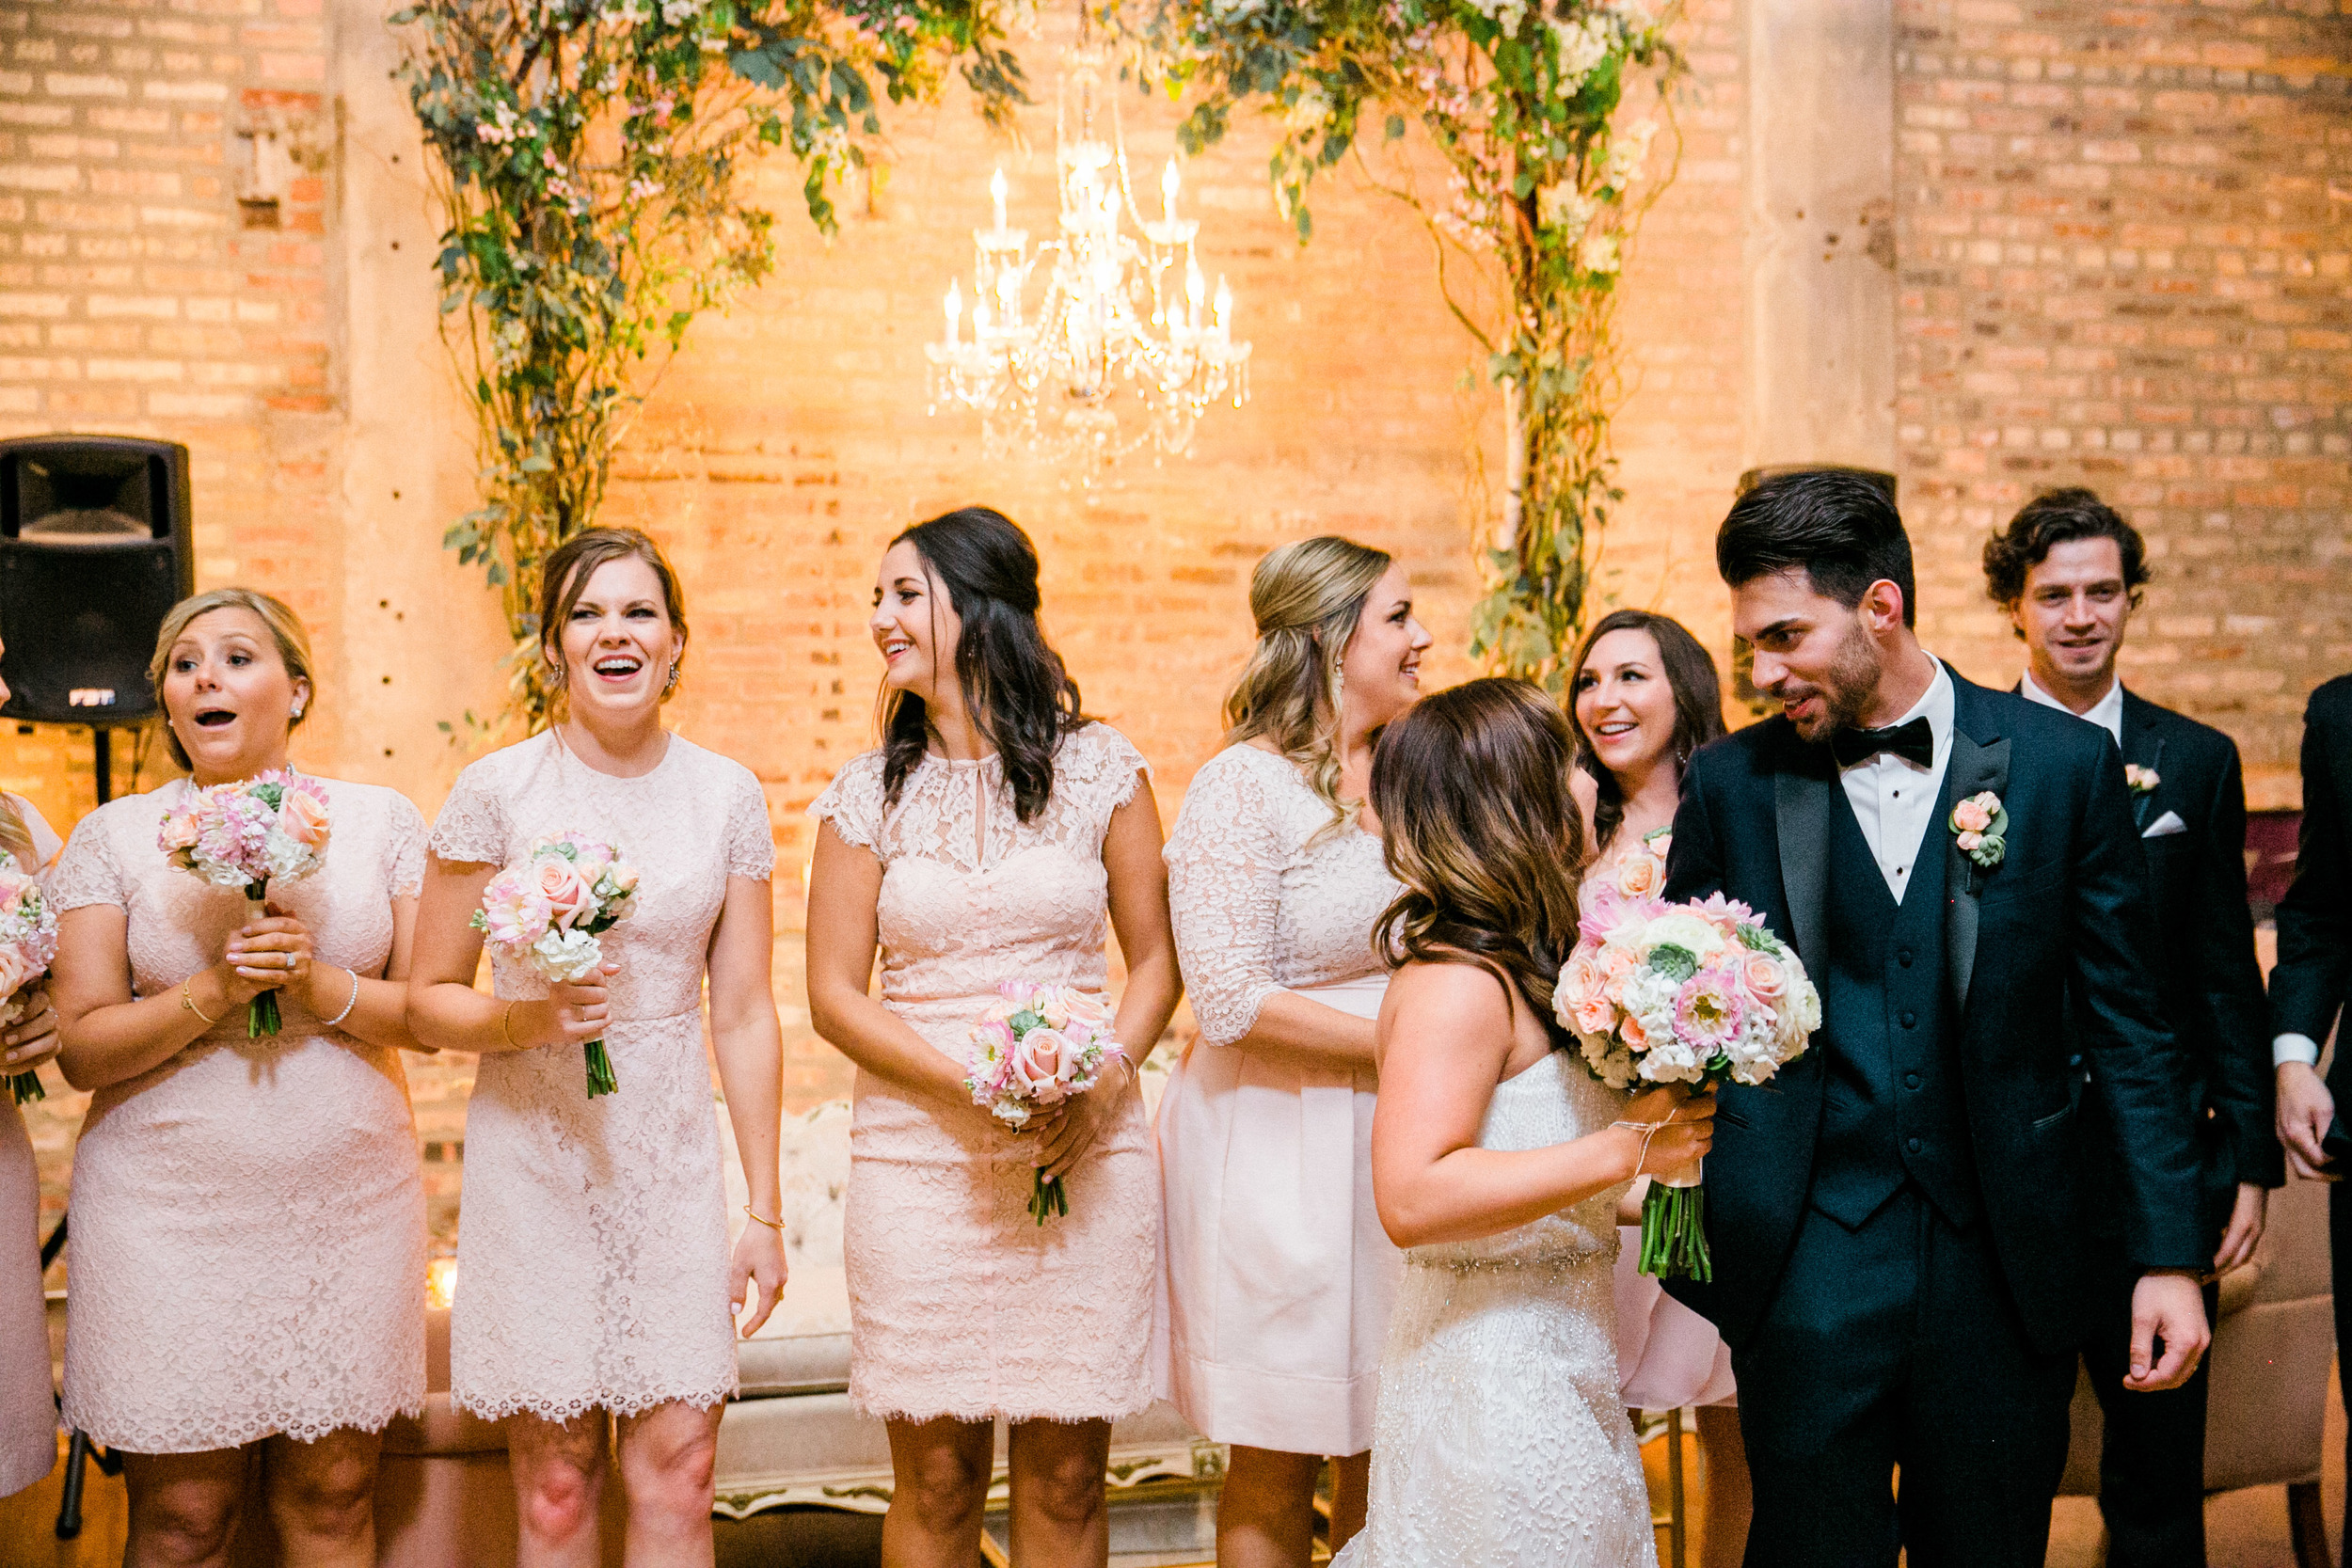 mayden_photography_weddings-141.jpg